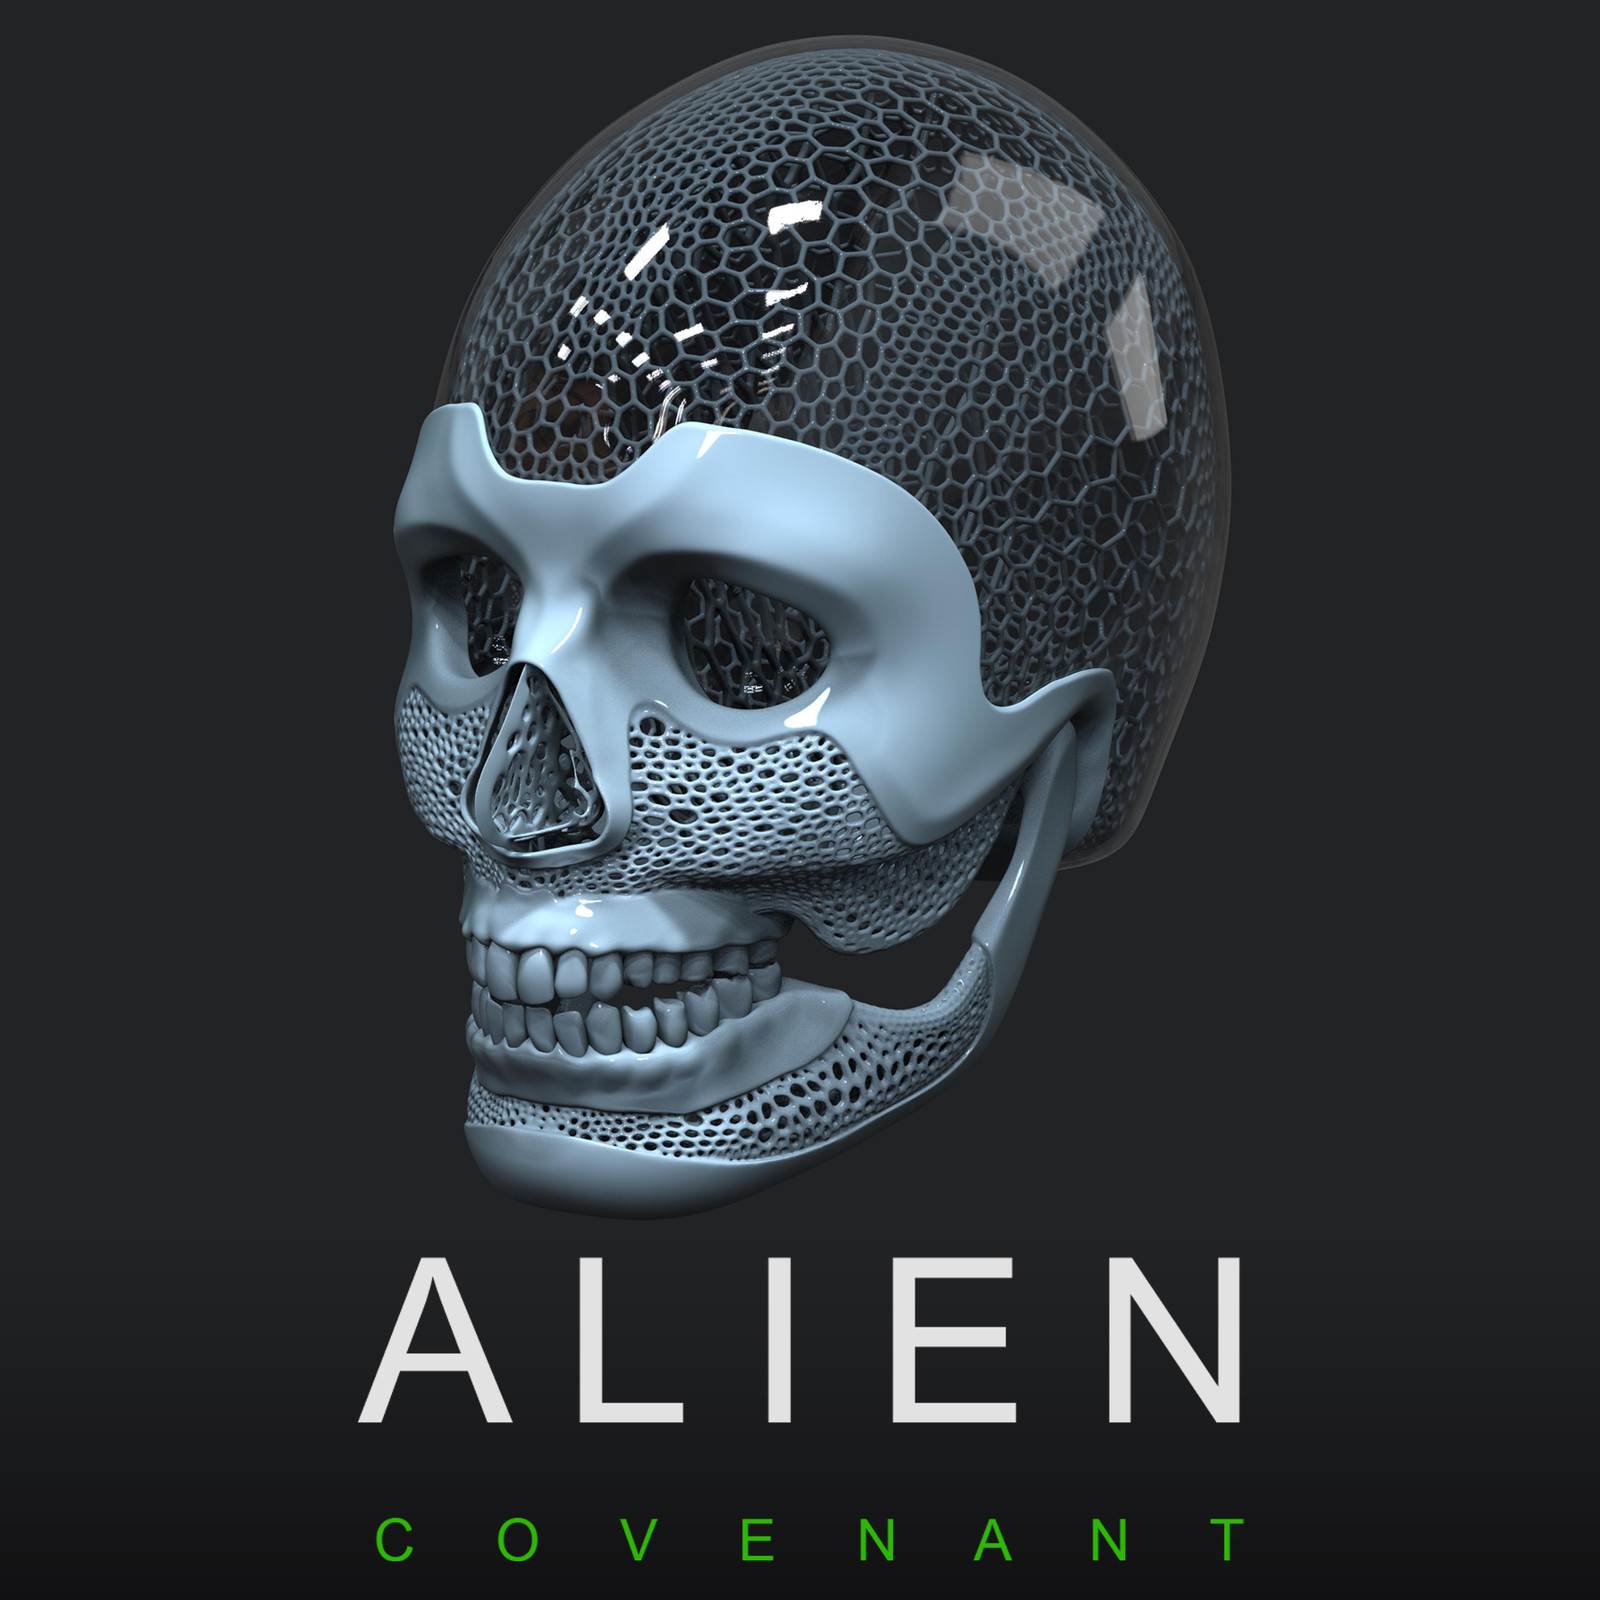 Alien Covenant - Meet Walter